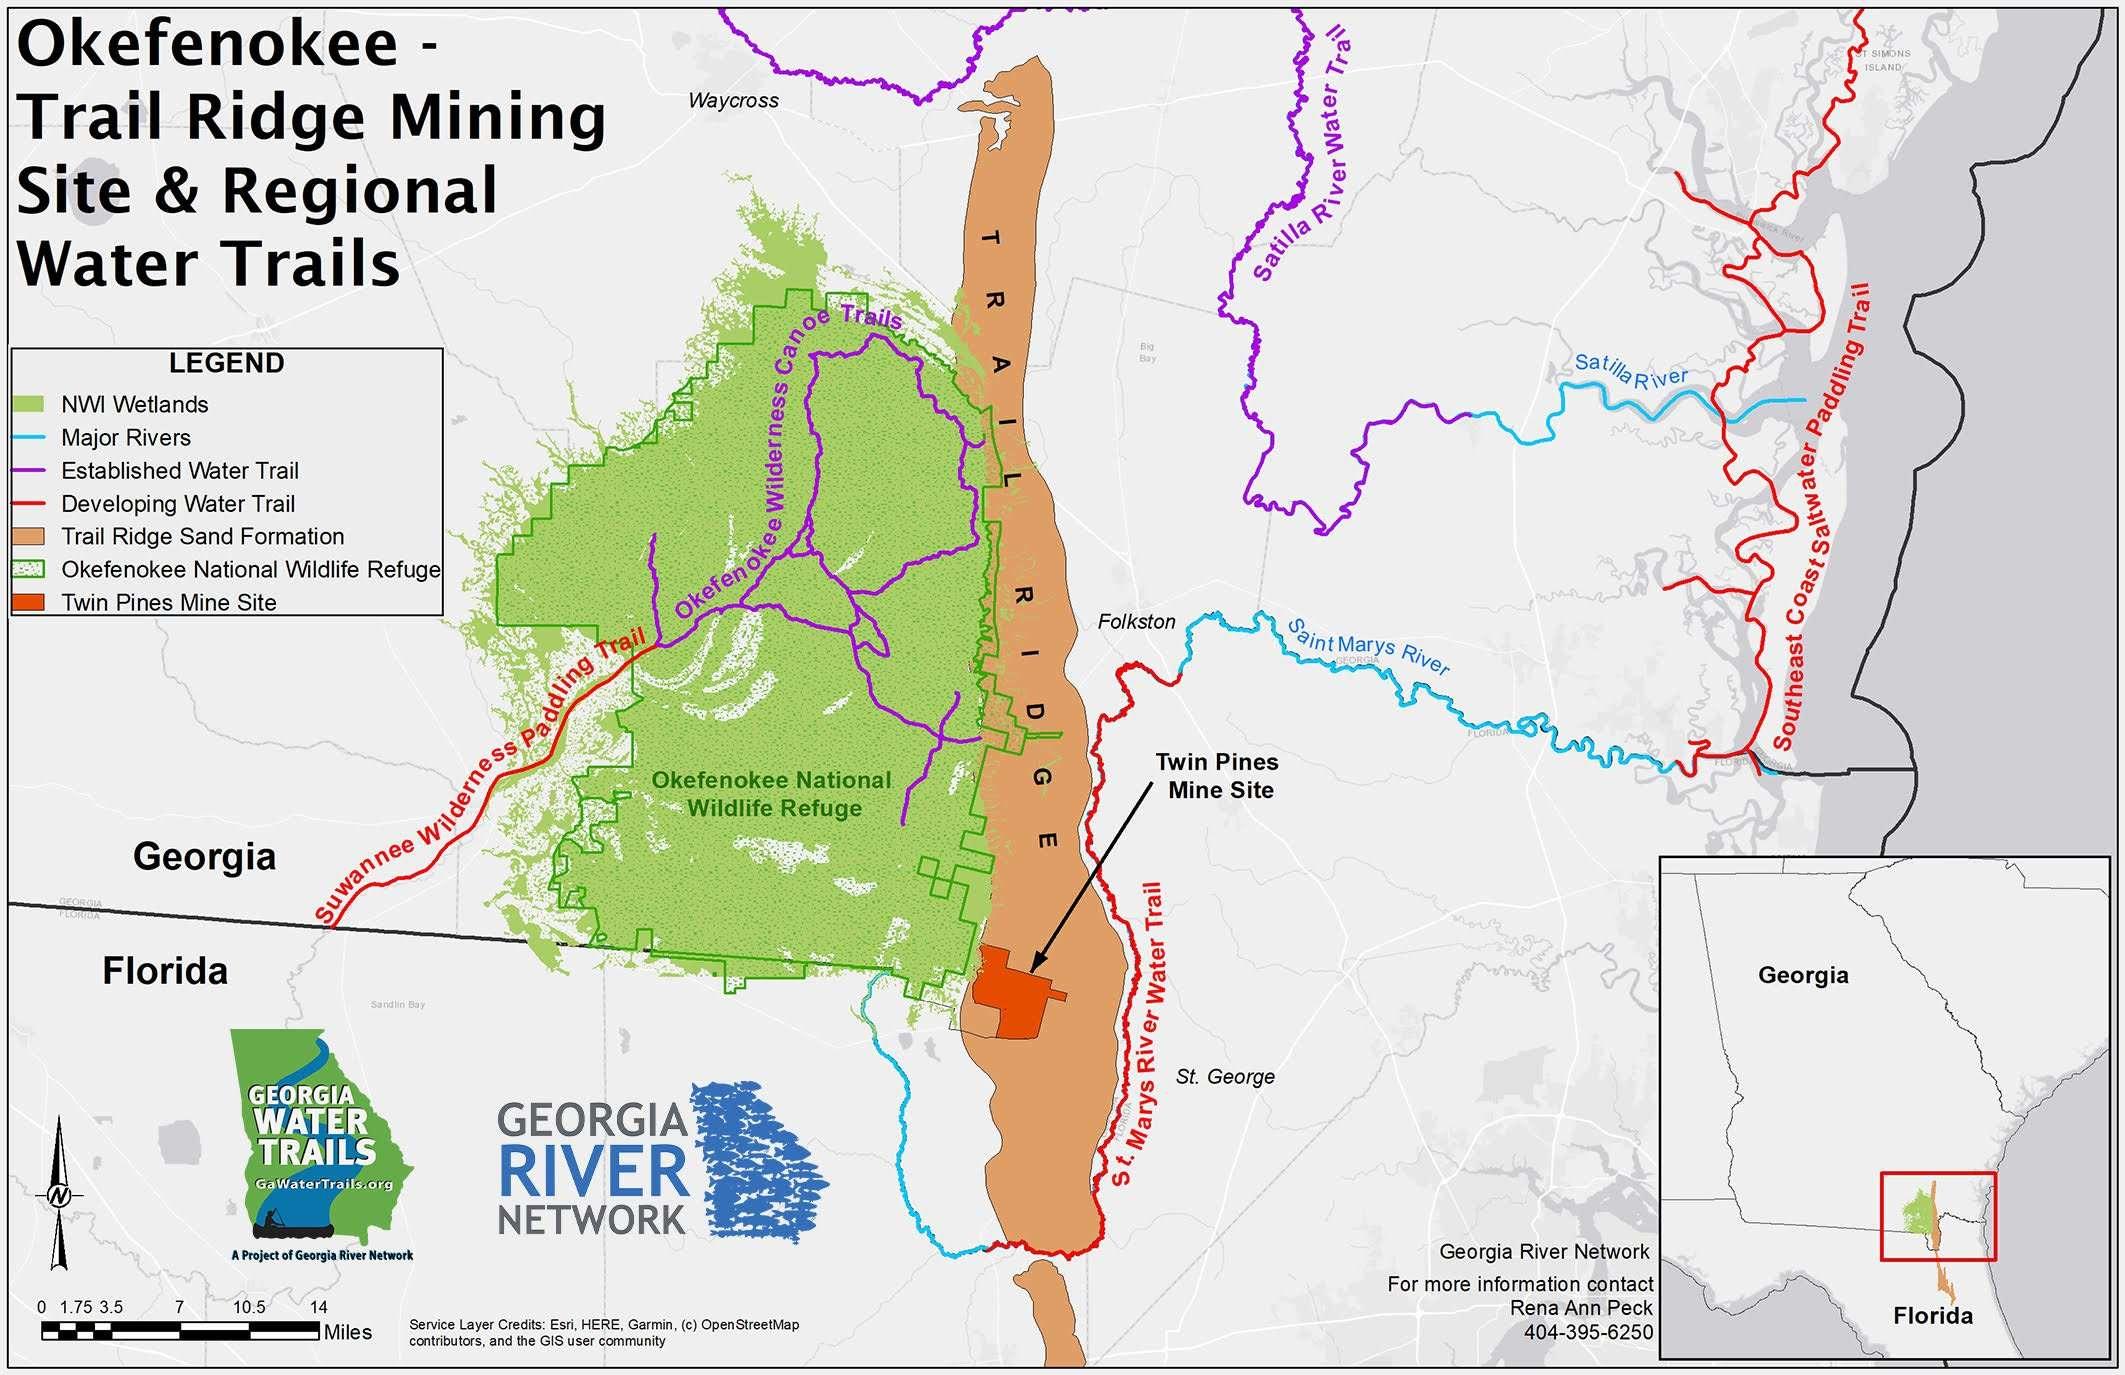 Okefenokee Trail Ridge Minine Site & Regional Water Trails